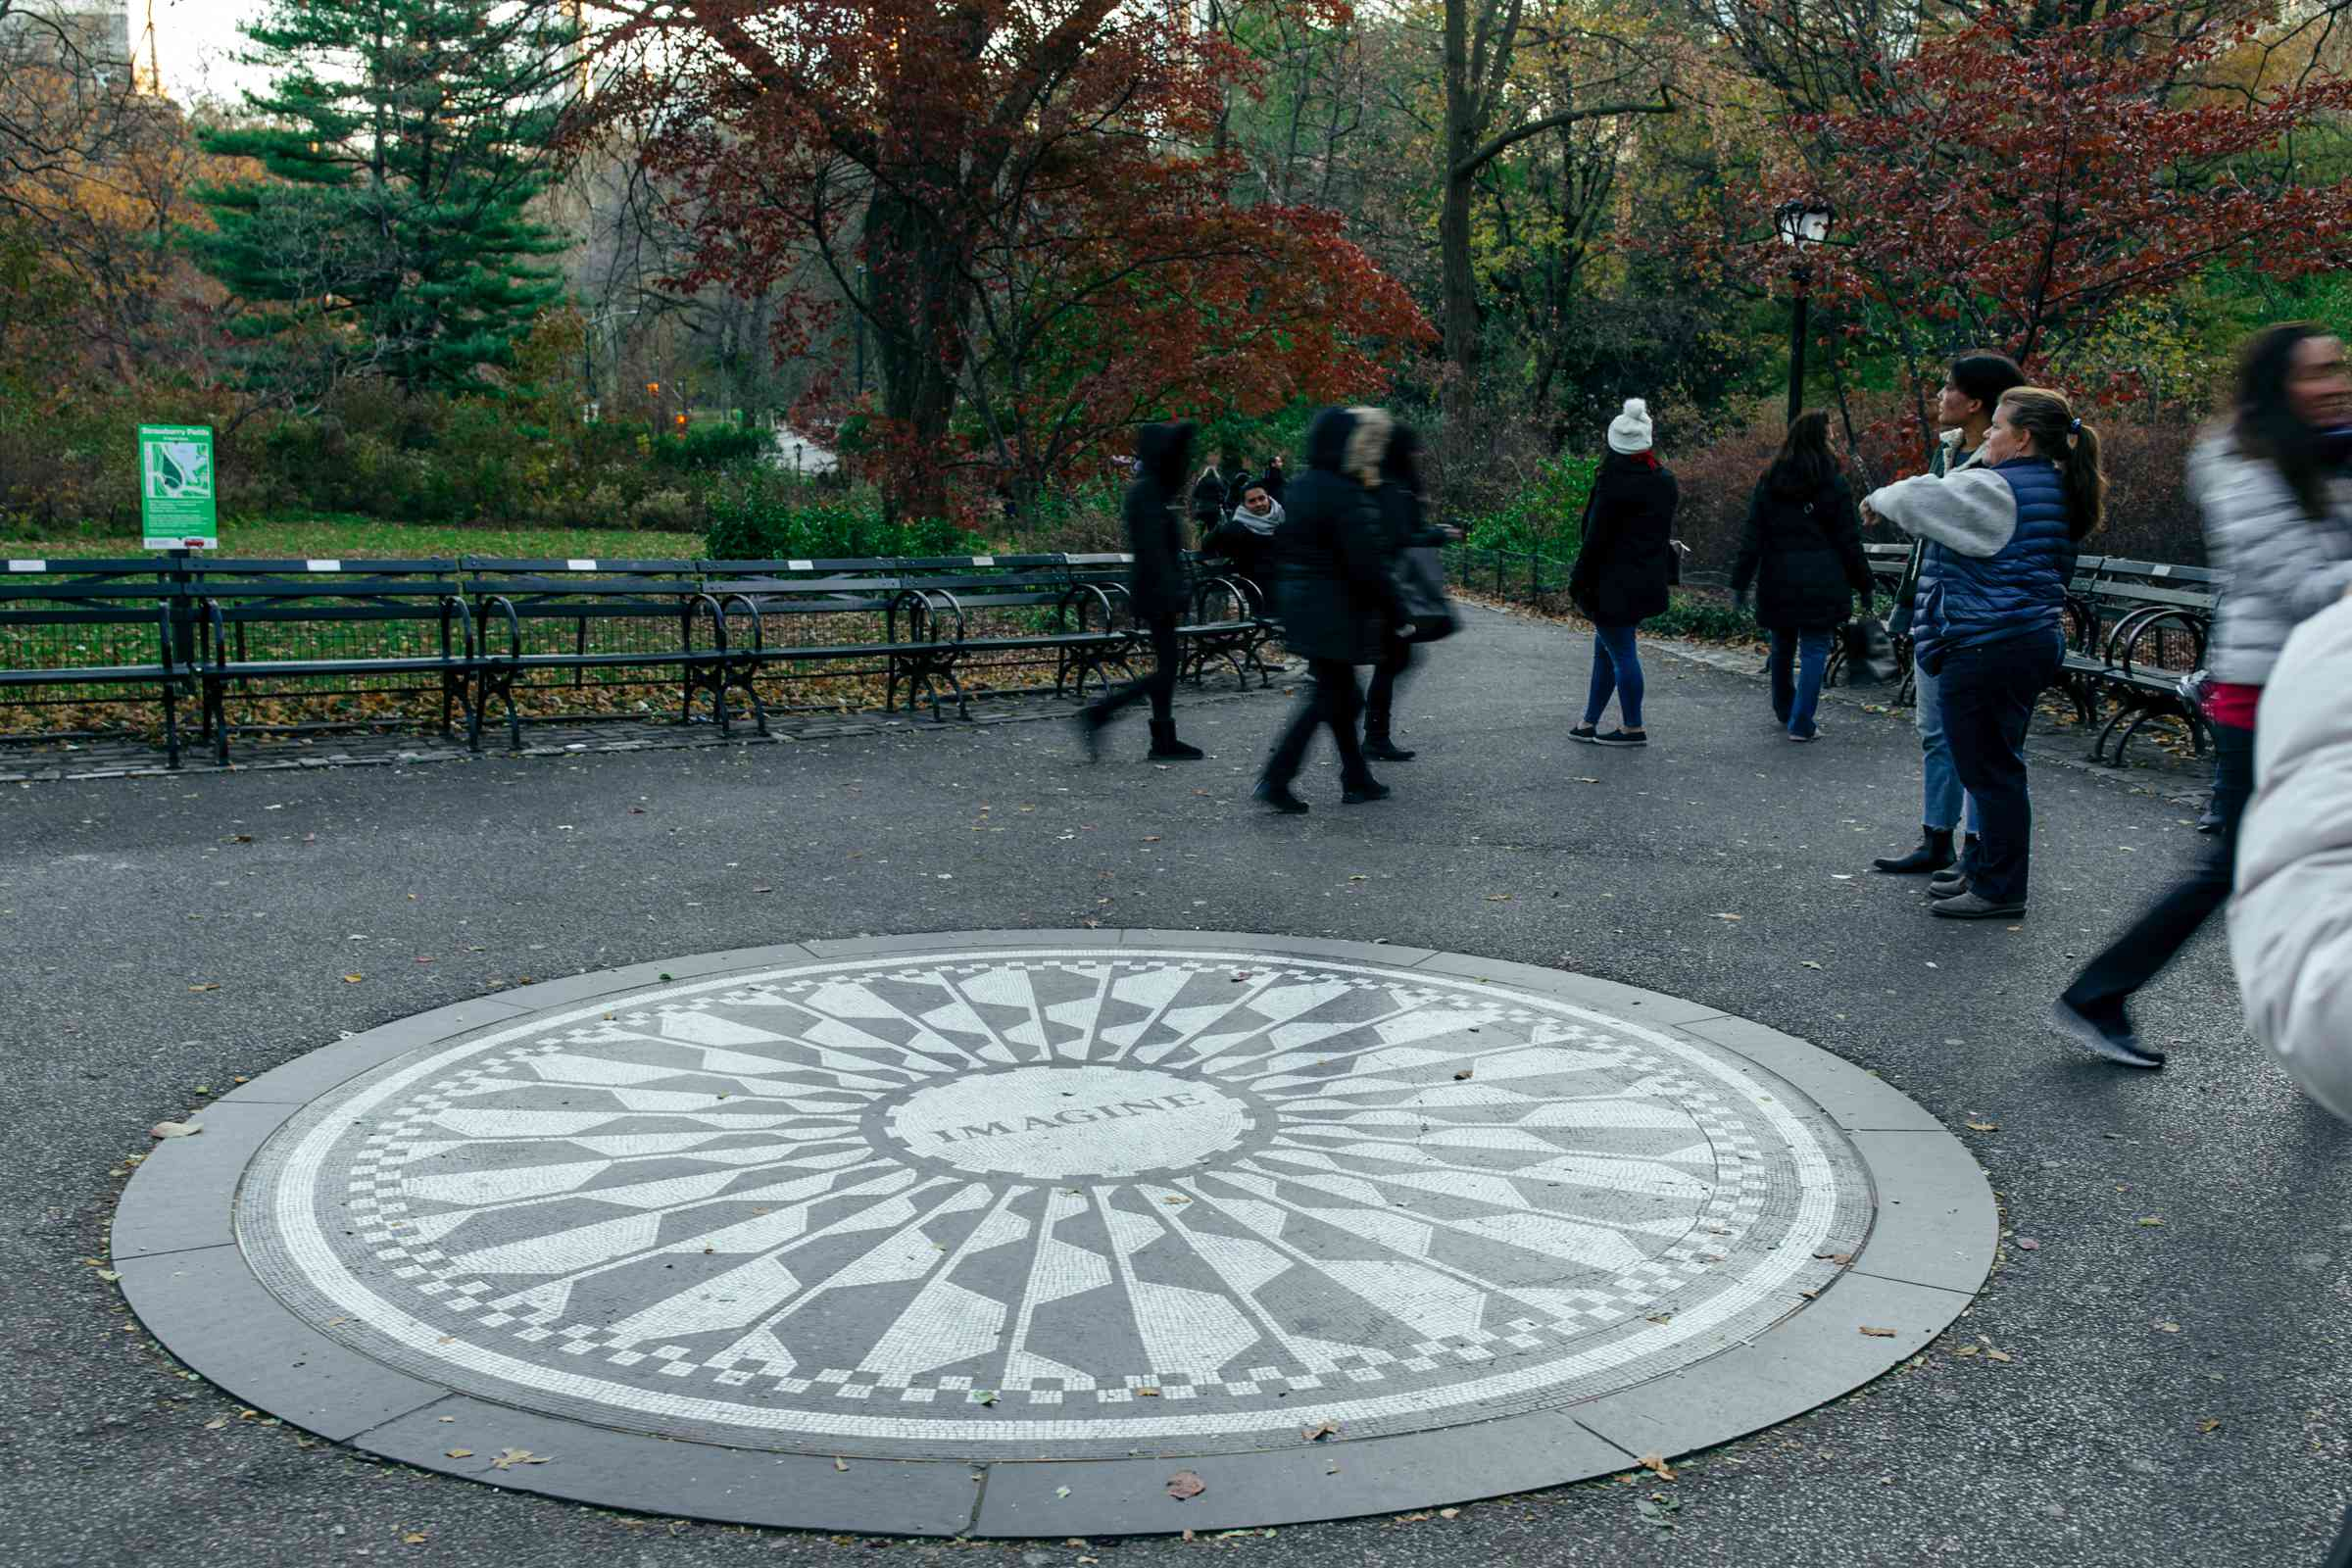 Imagine Memorial in Central Park, NYC